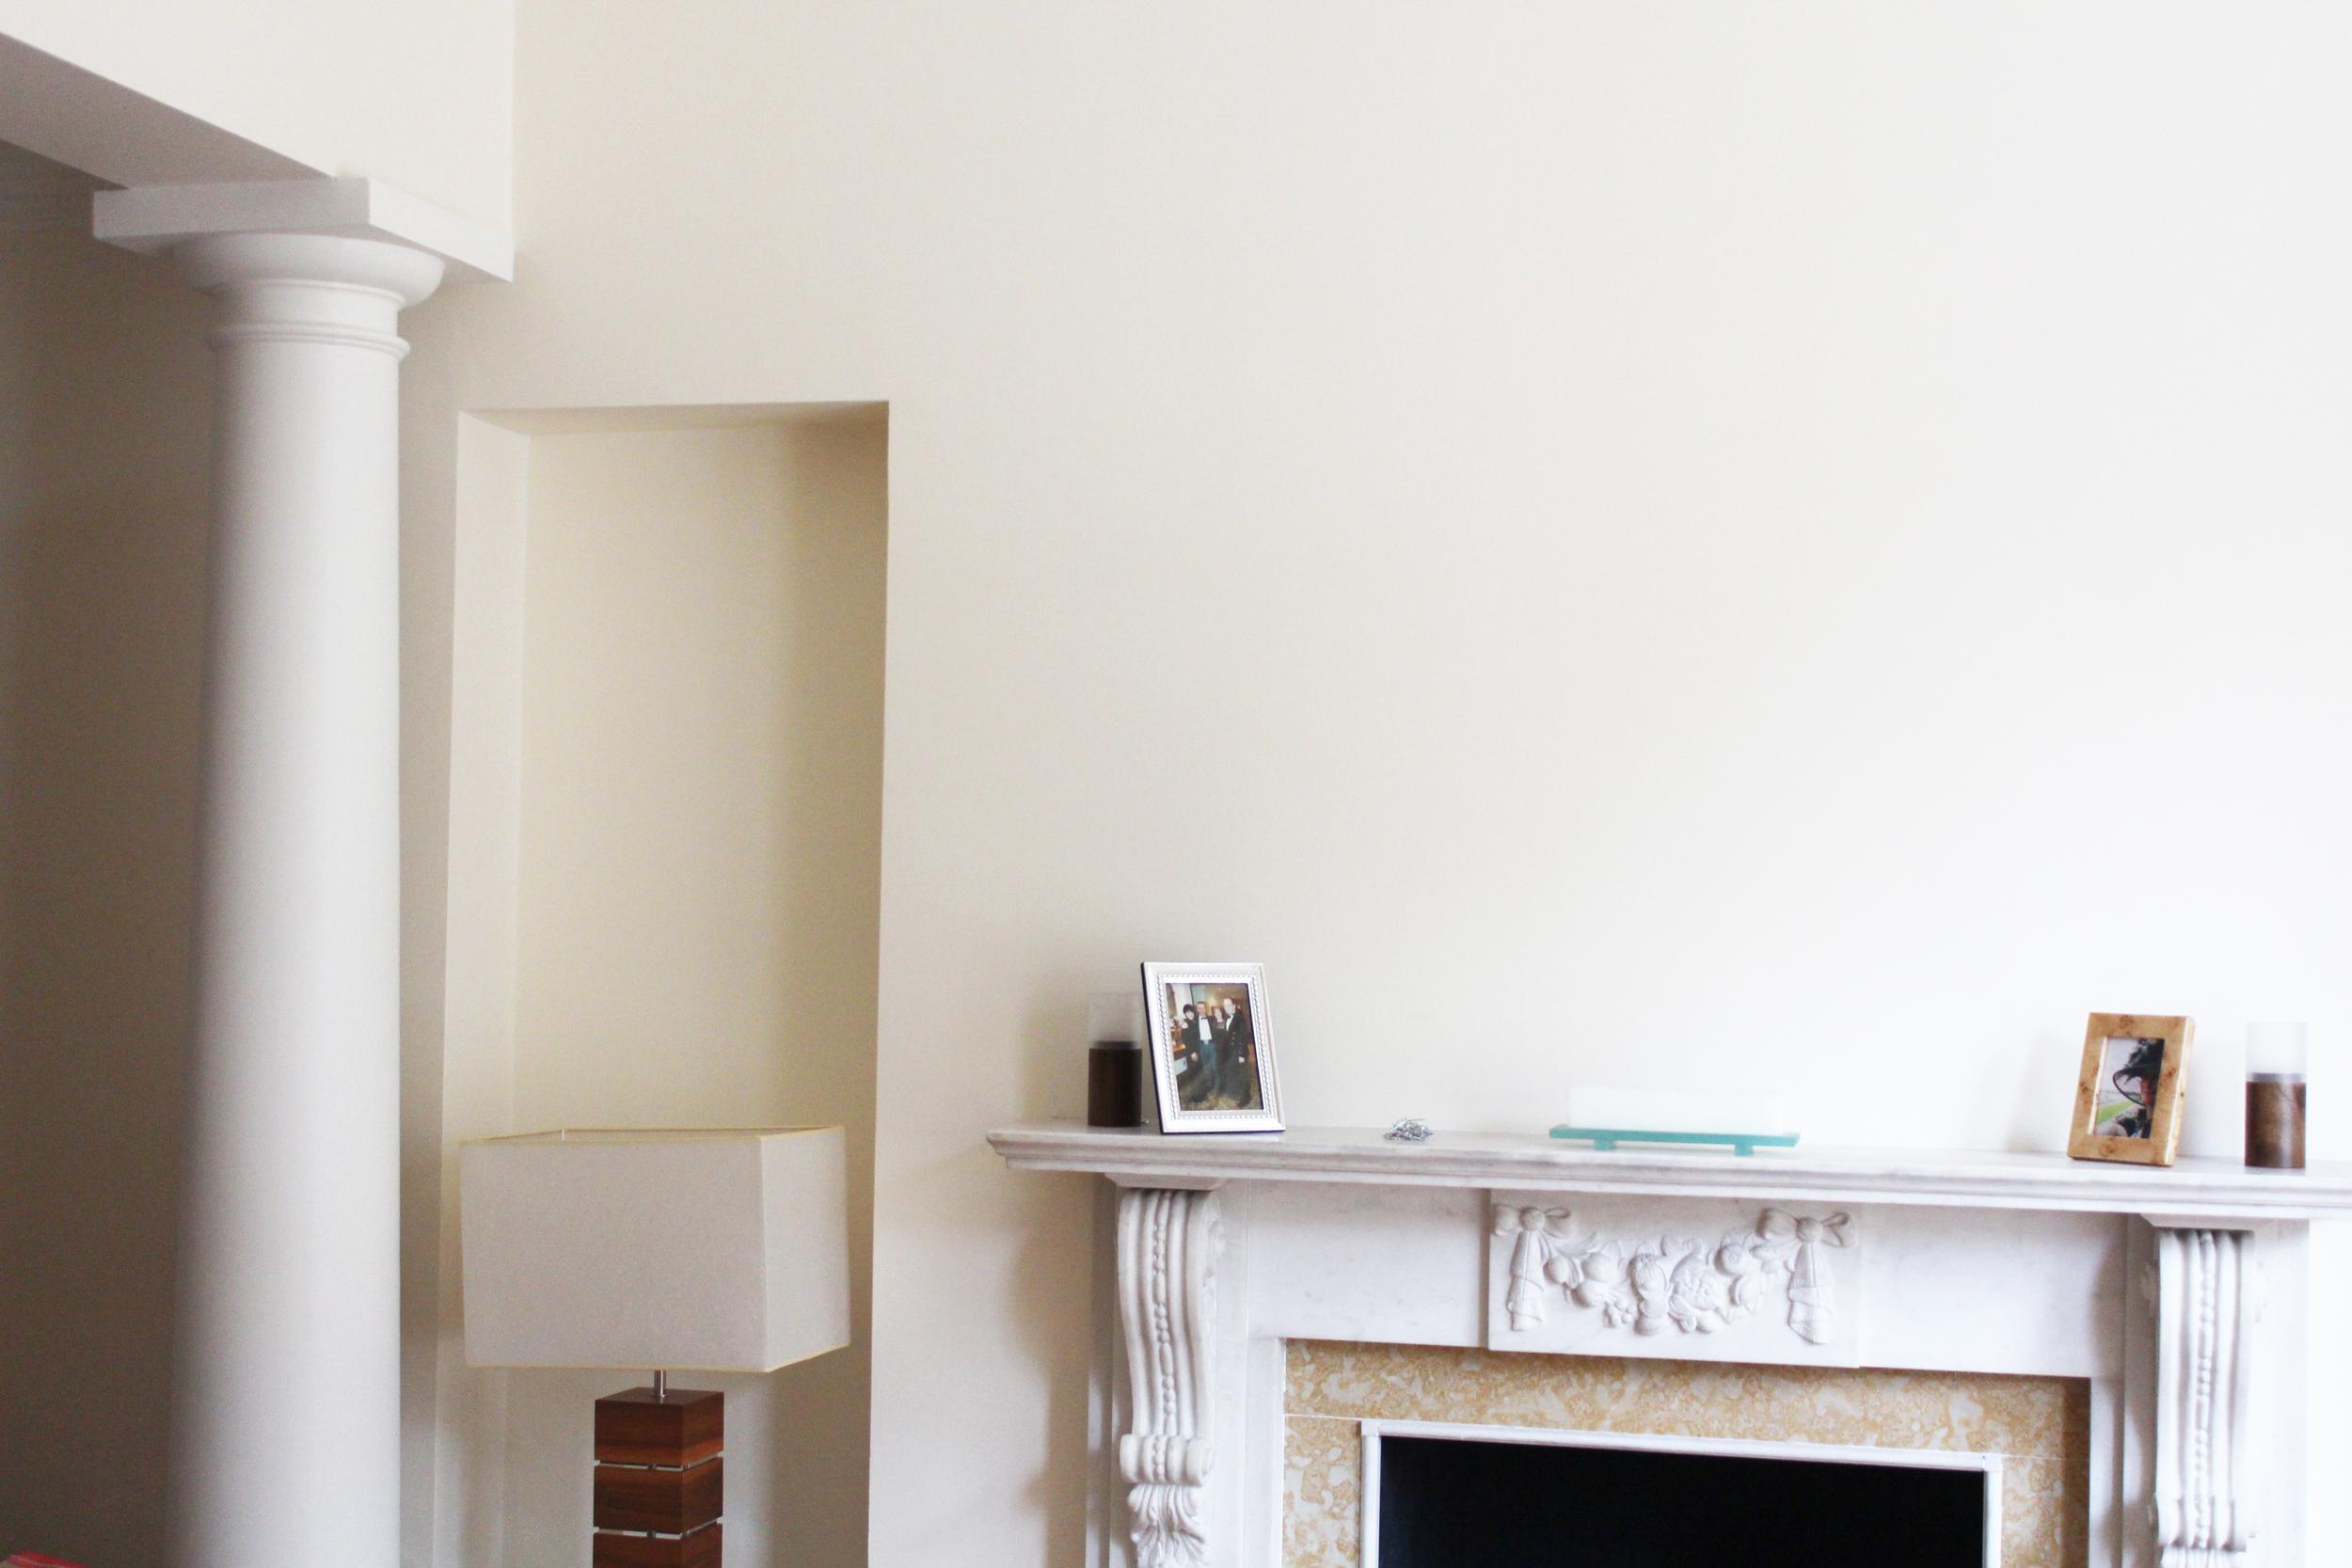 #NHRenovations #Painter #Decorator #London #Kensington #Knightsbridge #Marbel #Fireplace #Farrowandball #Farrow #Allwhite #Ceilings #Woodwork #Tallow #Walls #eggshell